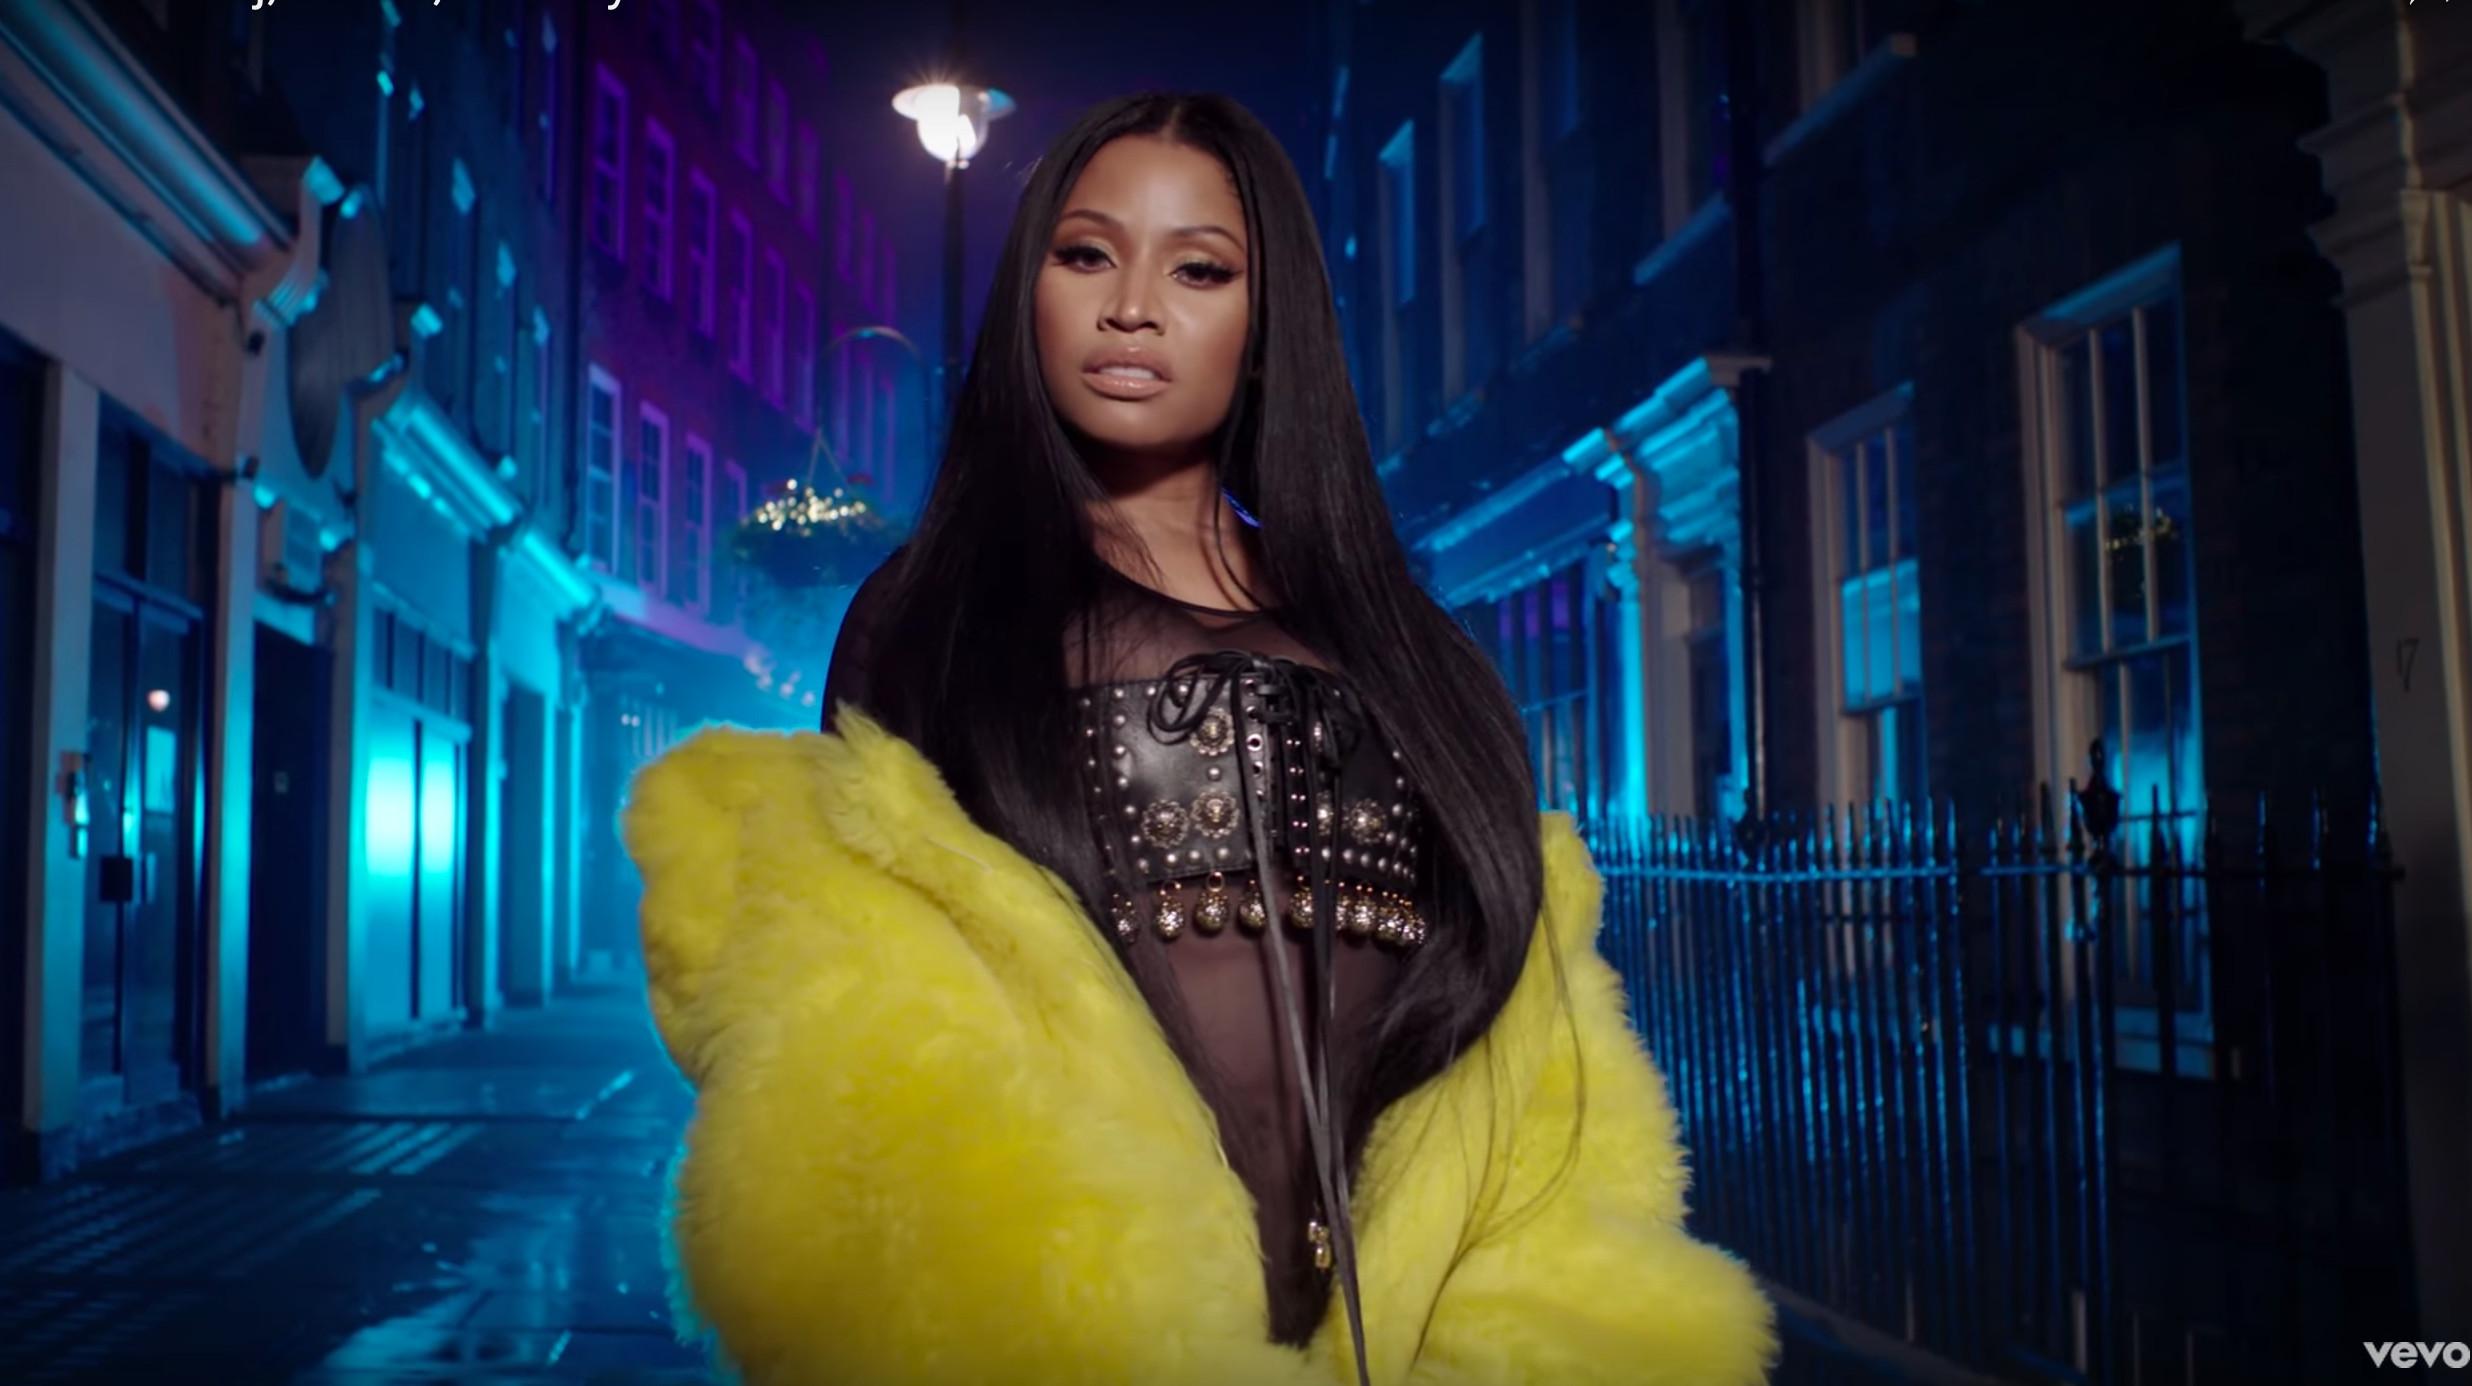 The video for Nicki Minaj's track No Frauds, featuring Drake and Lil Wayne